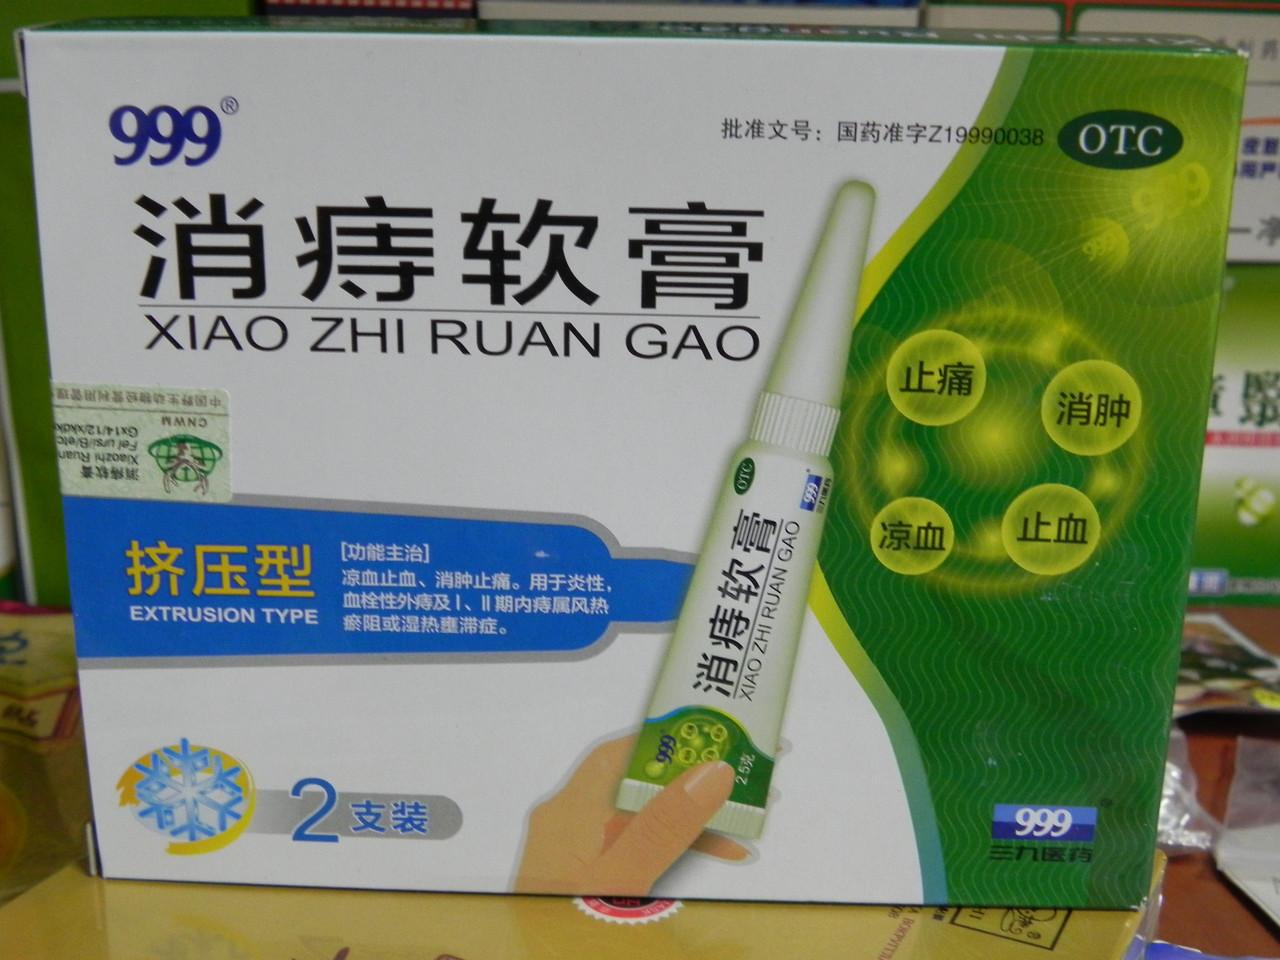 Мазь «Сяо Чжи Руань Гао» 999, от геморроя (Xiaozhi Ruangao2 тюб/./2.5 гр.)